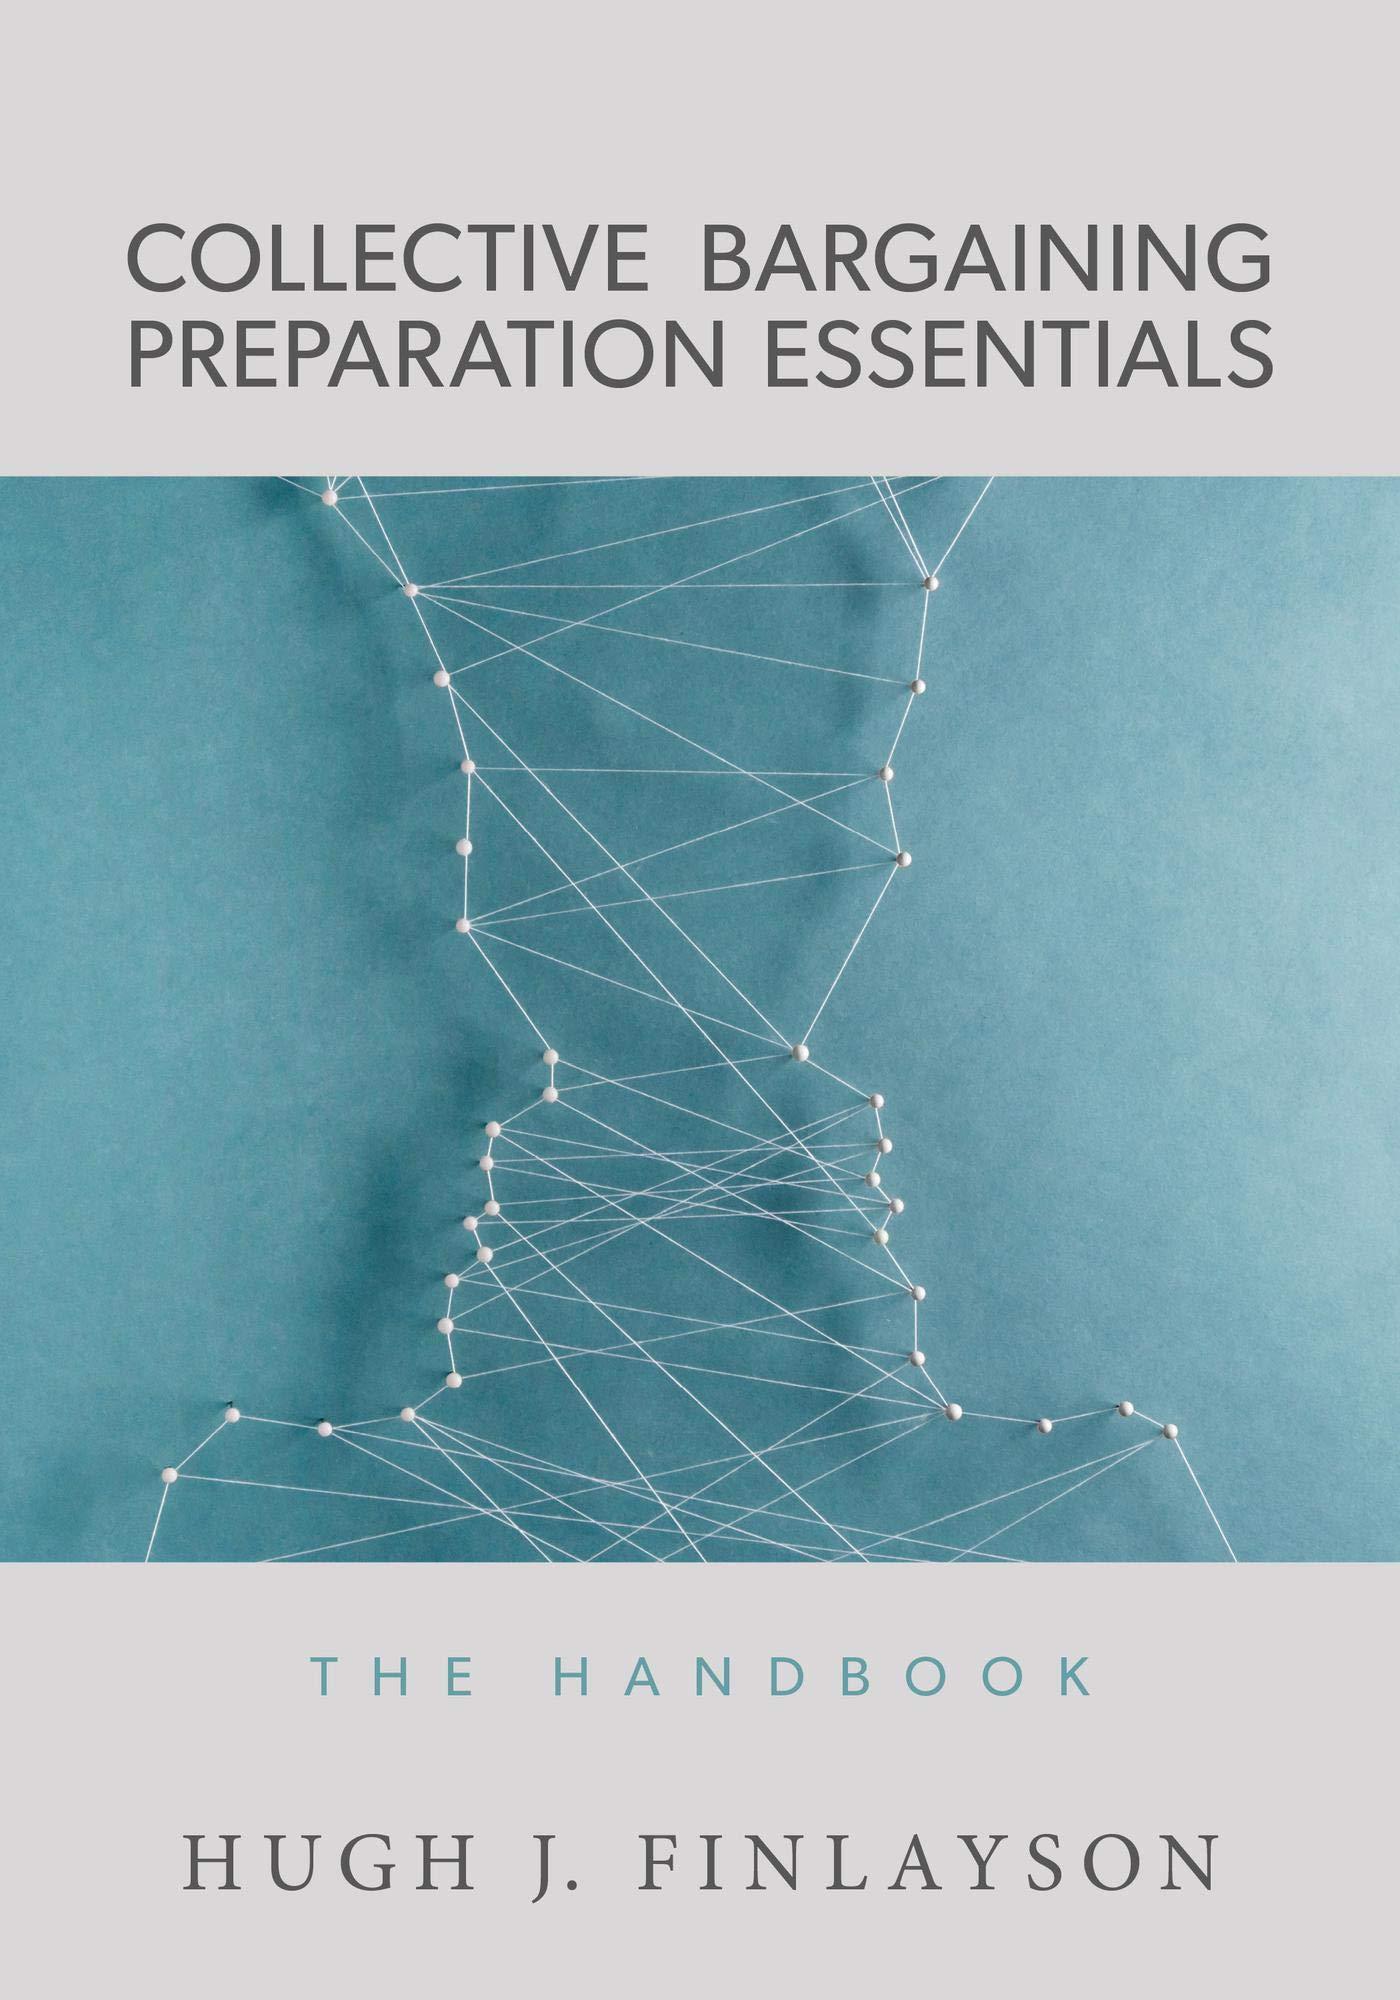 Collective Bargaining Preparation Essentials: The Handbook